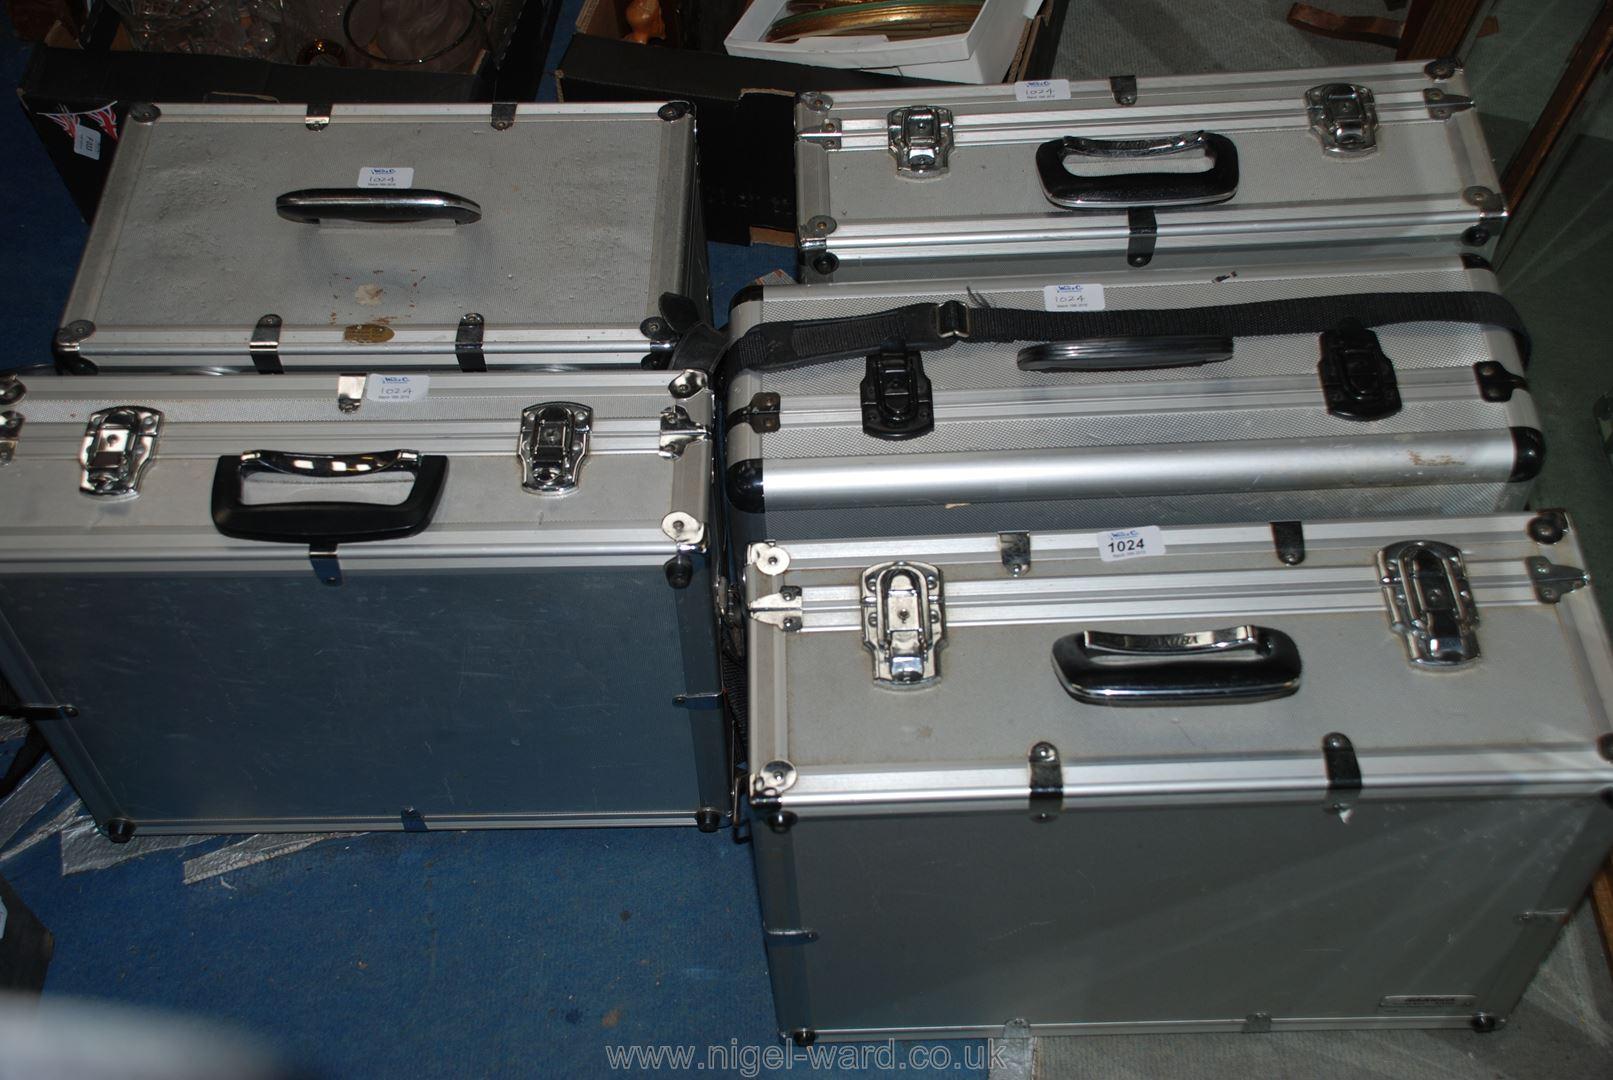 Lot 1024 - Five large aluminium camera flight cases.